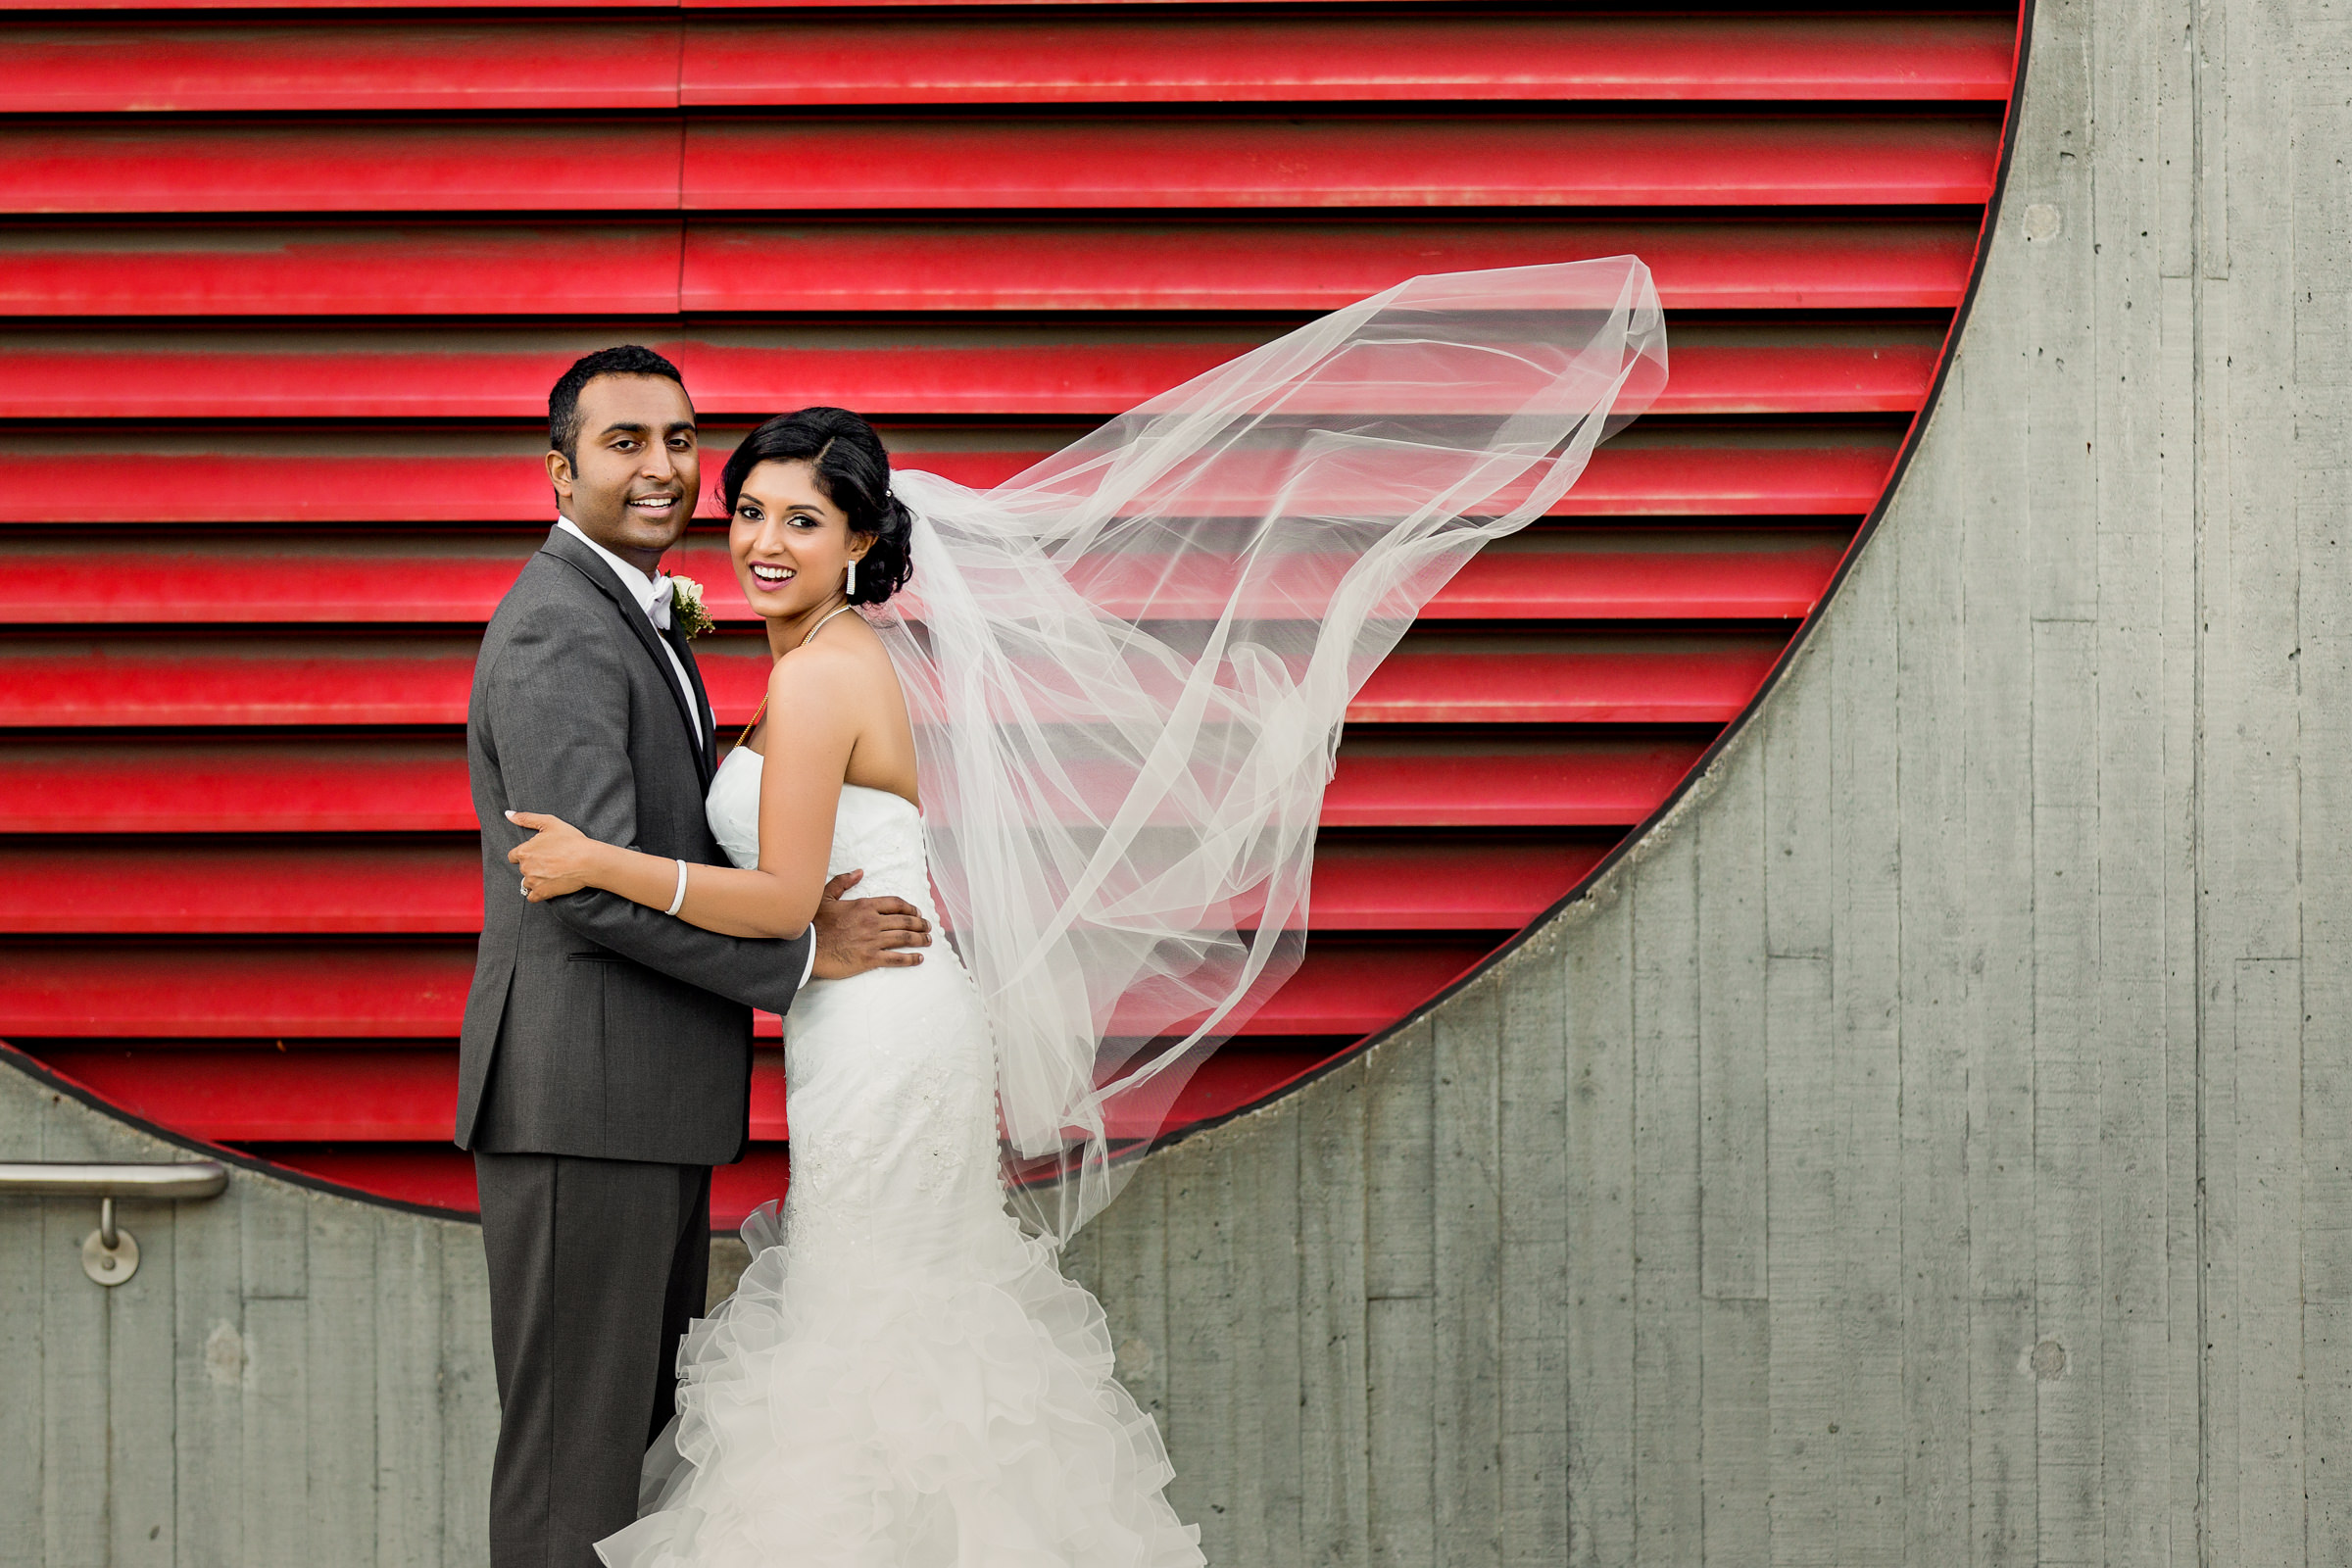 Couple portrait with bride's veil blowing - photo by Procopio Photography